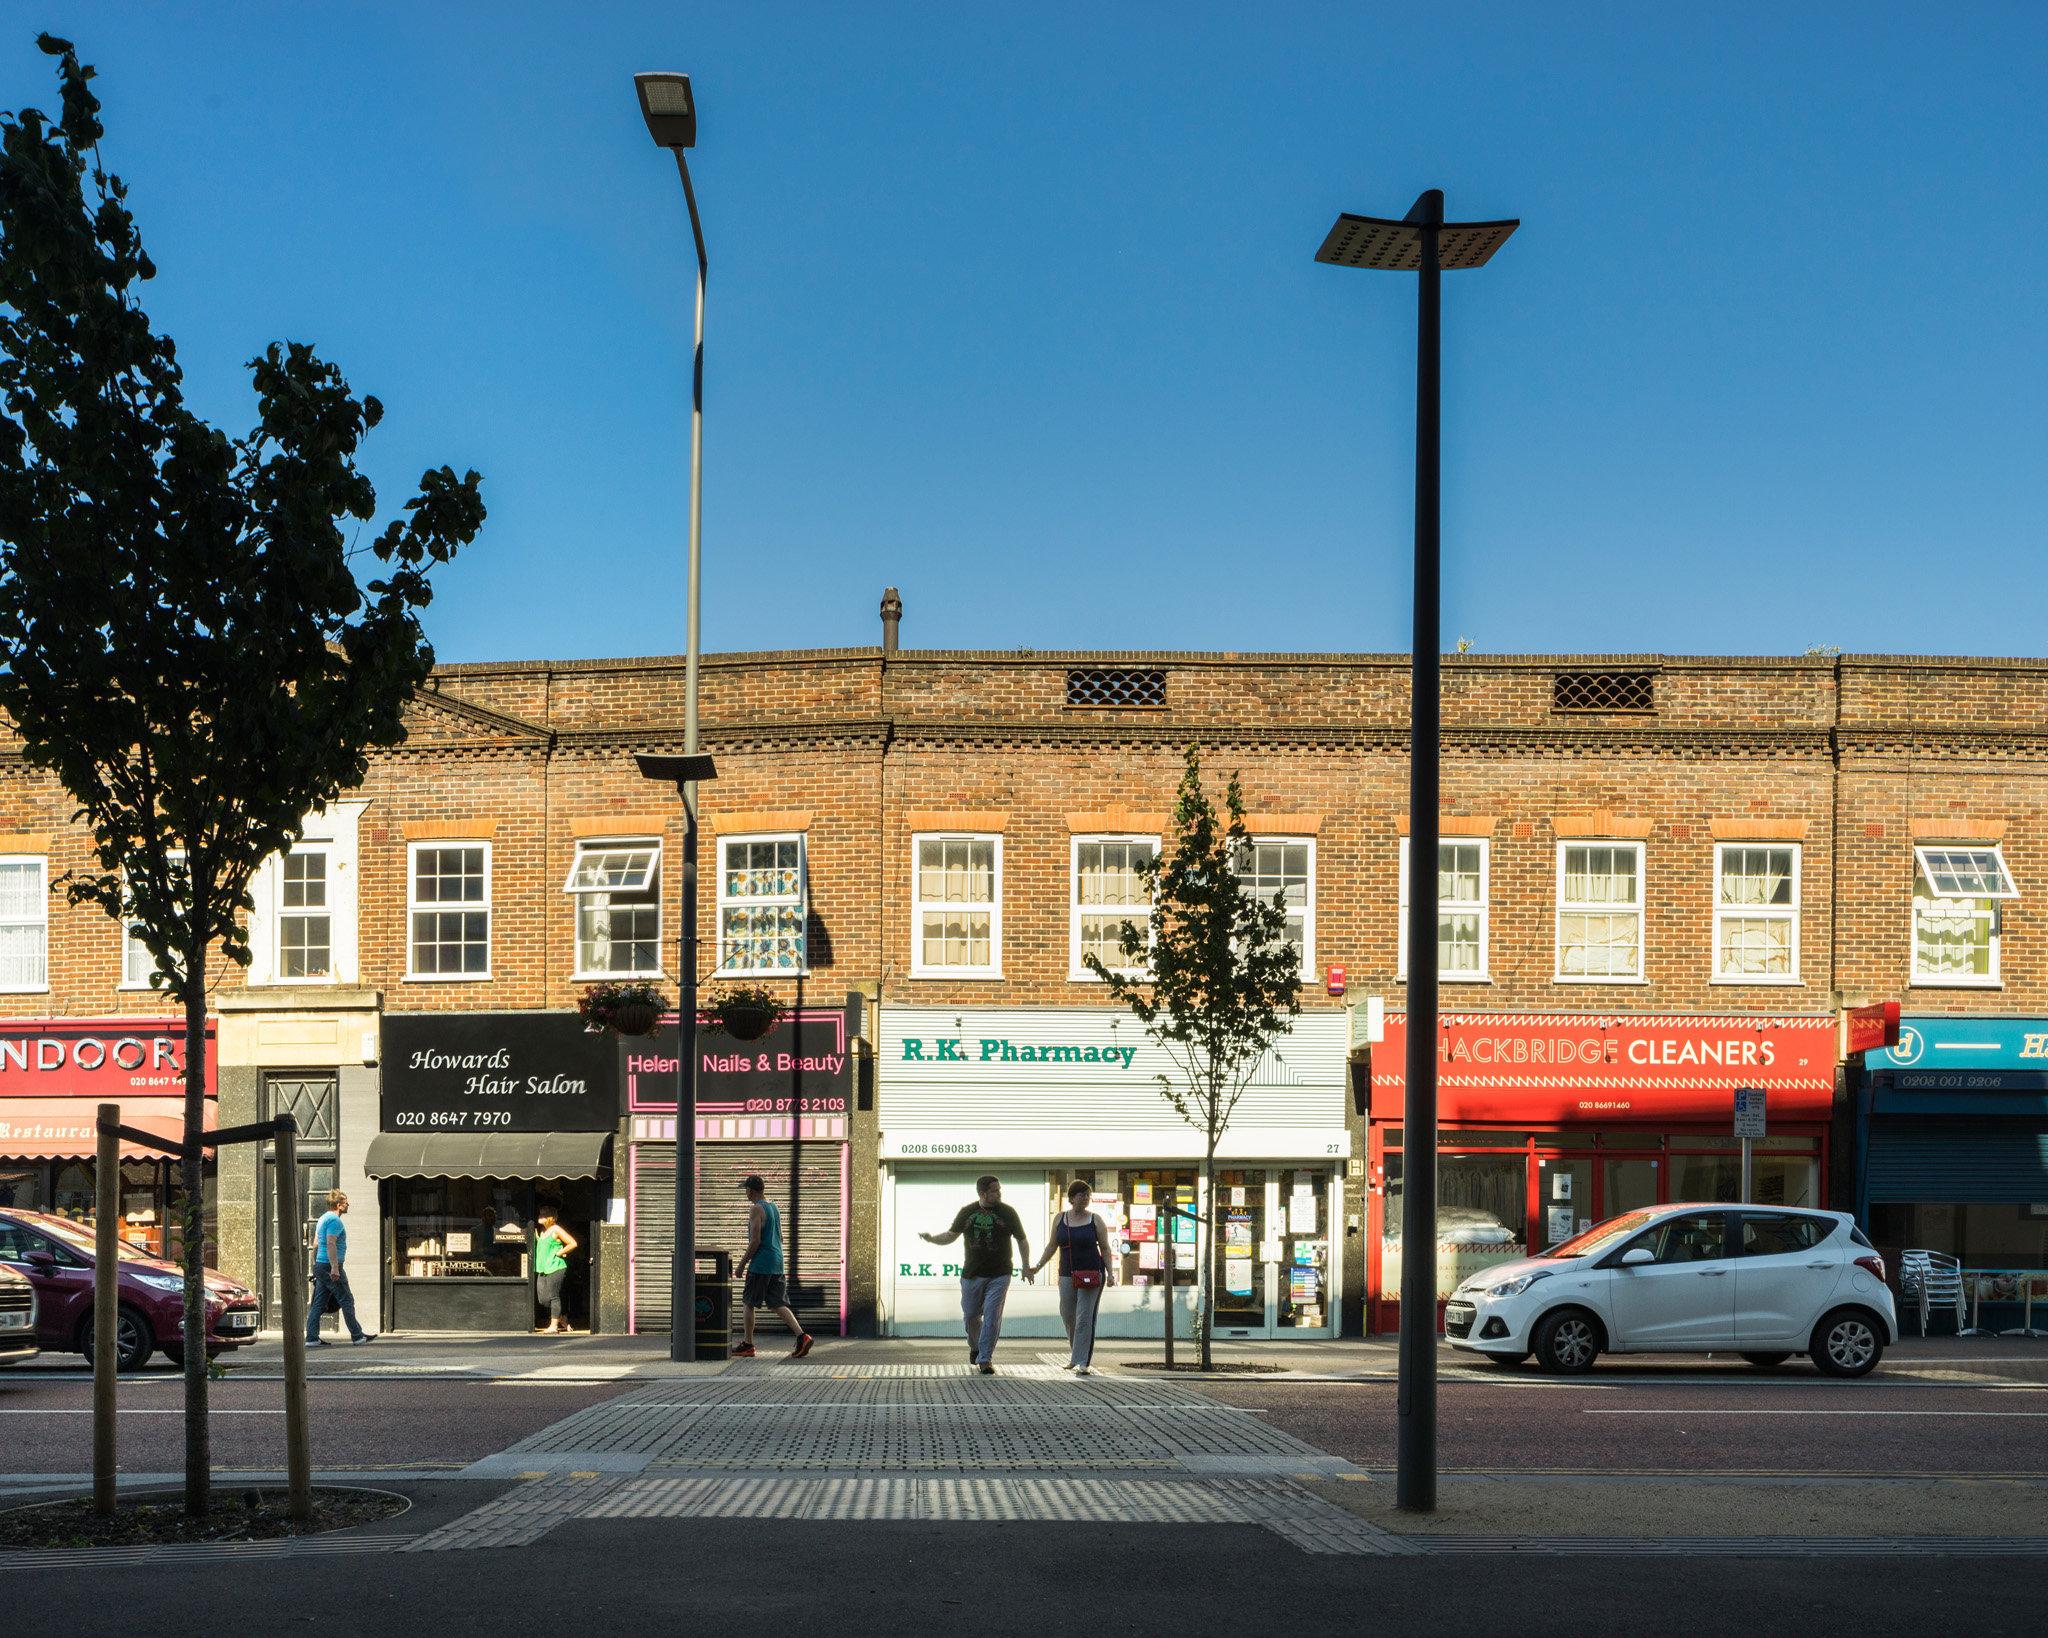 Hackbridge. Adams and Sutherland Architects